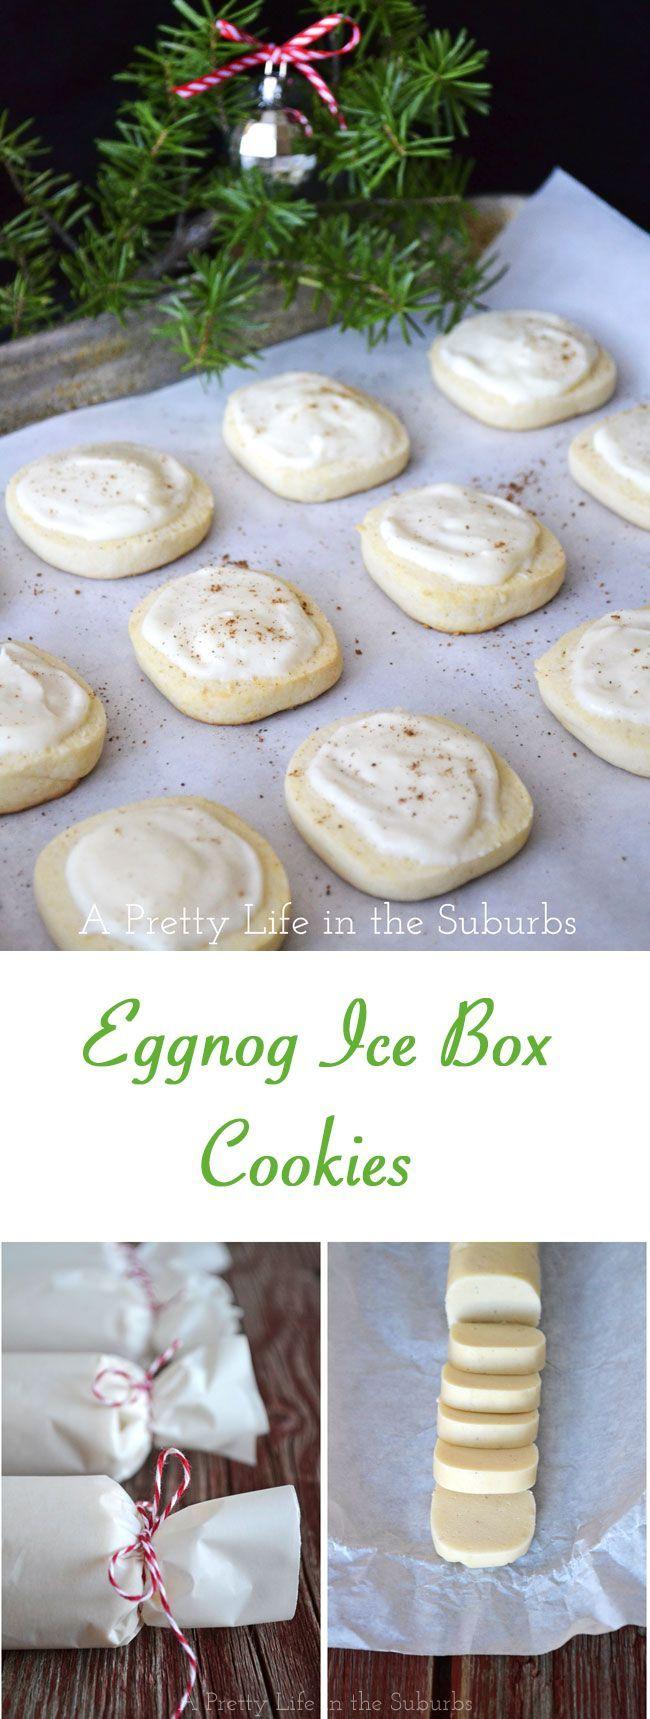 Eggnog Ice Box Cookies